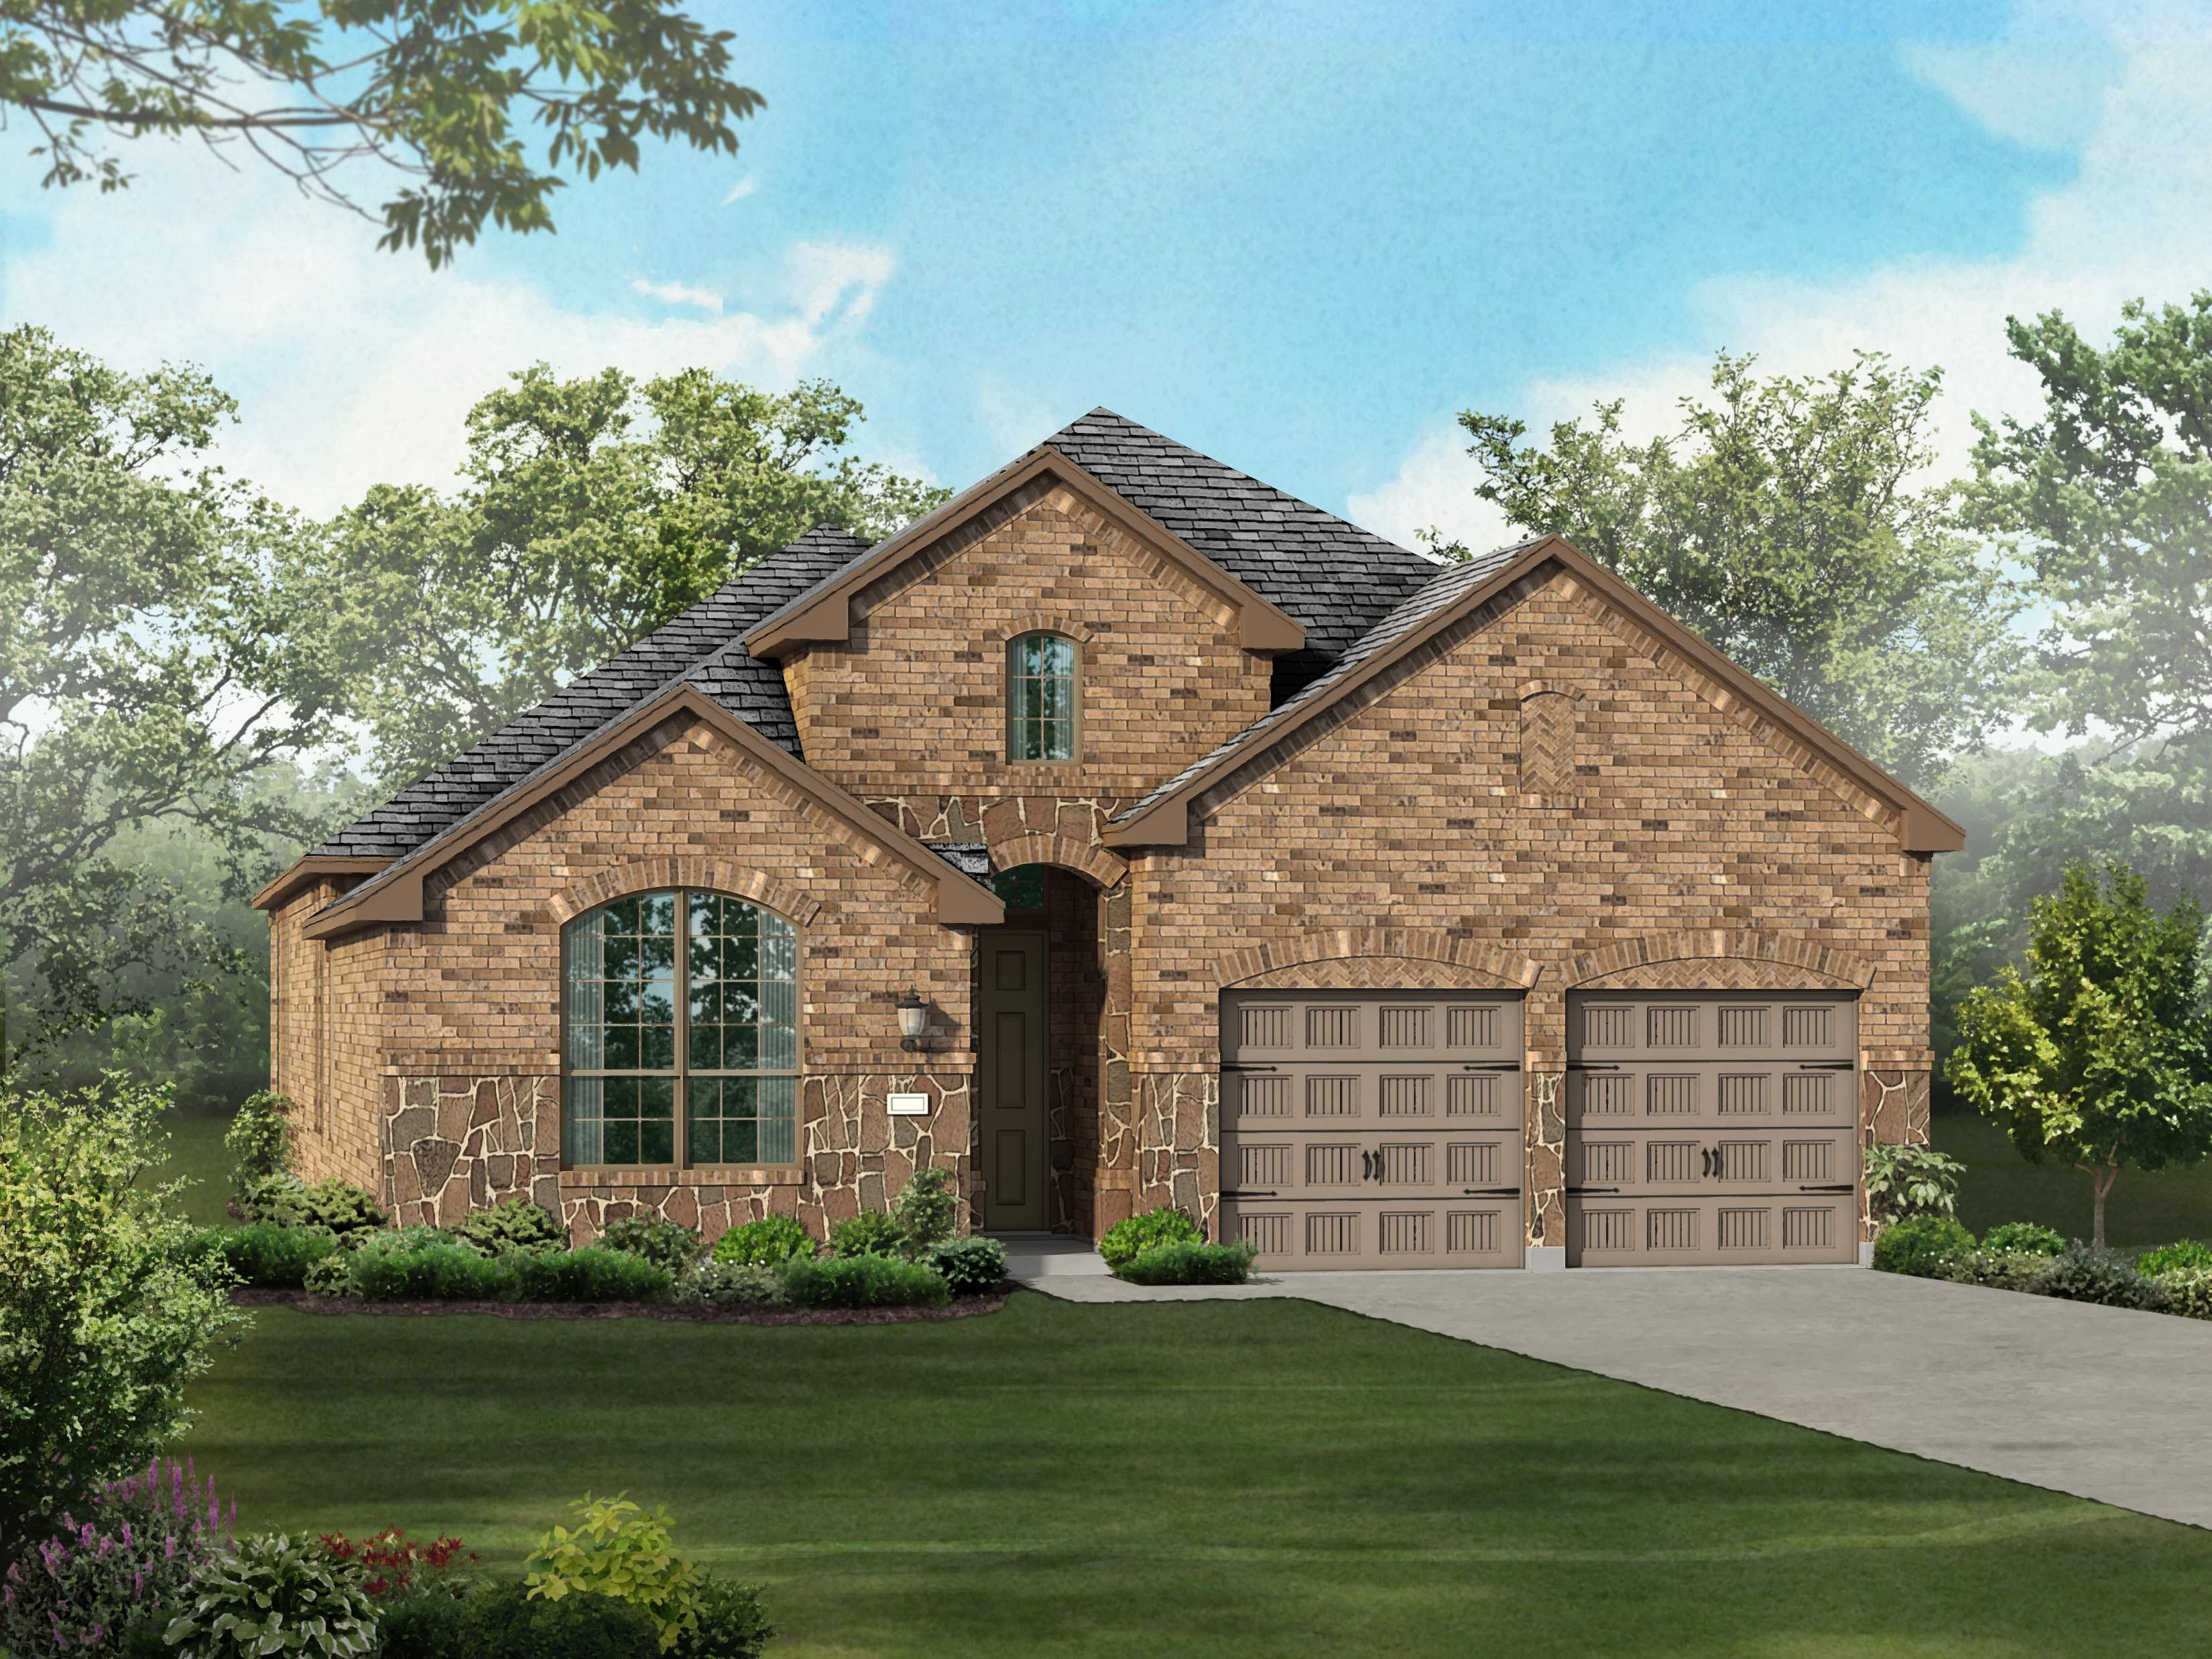 Highland Homes San Antonio TX Communities & Homes for Sale ...